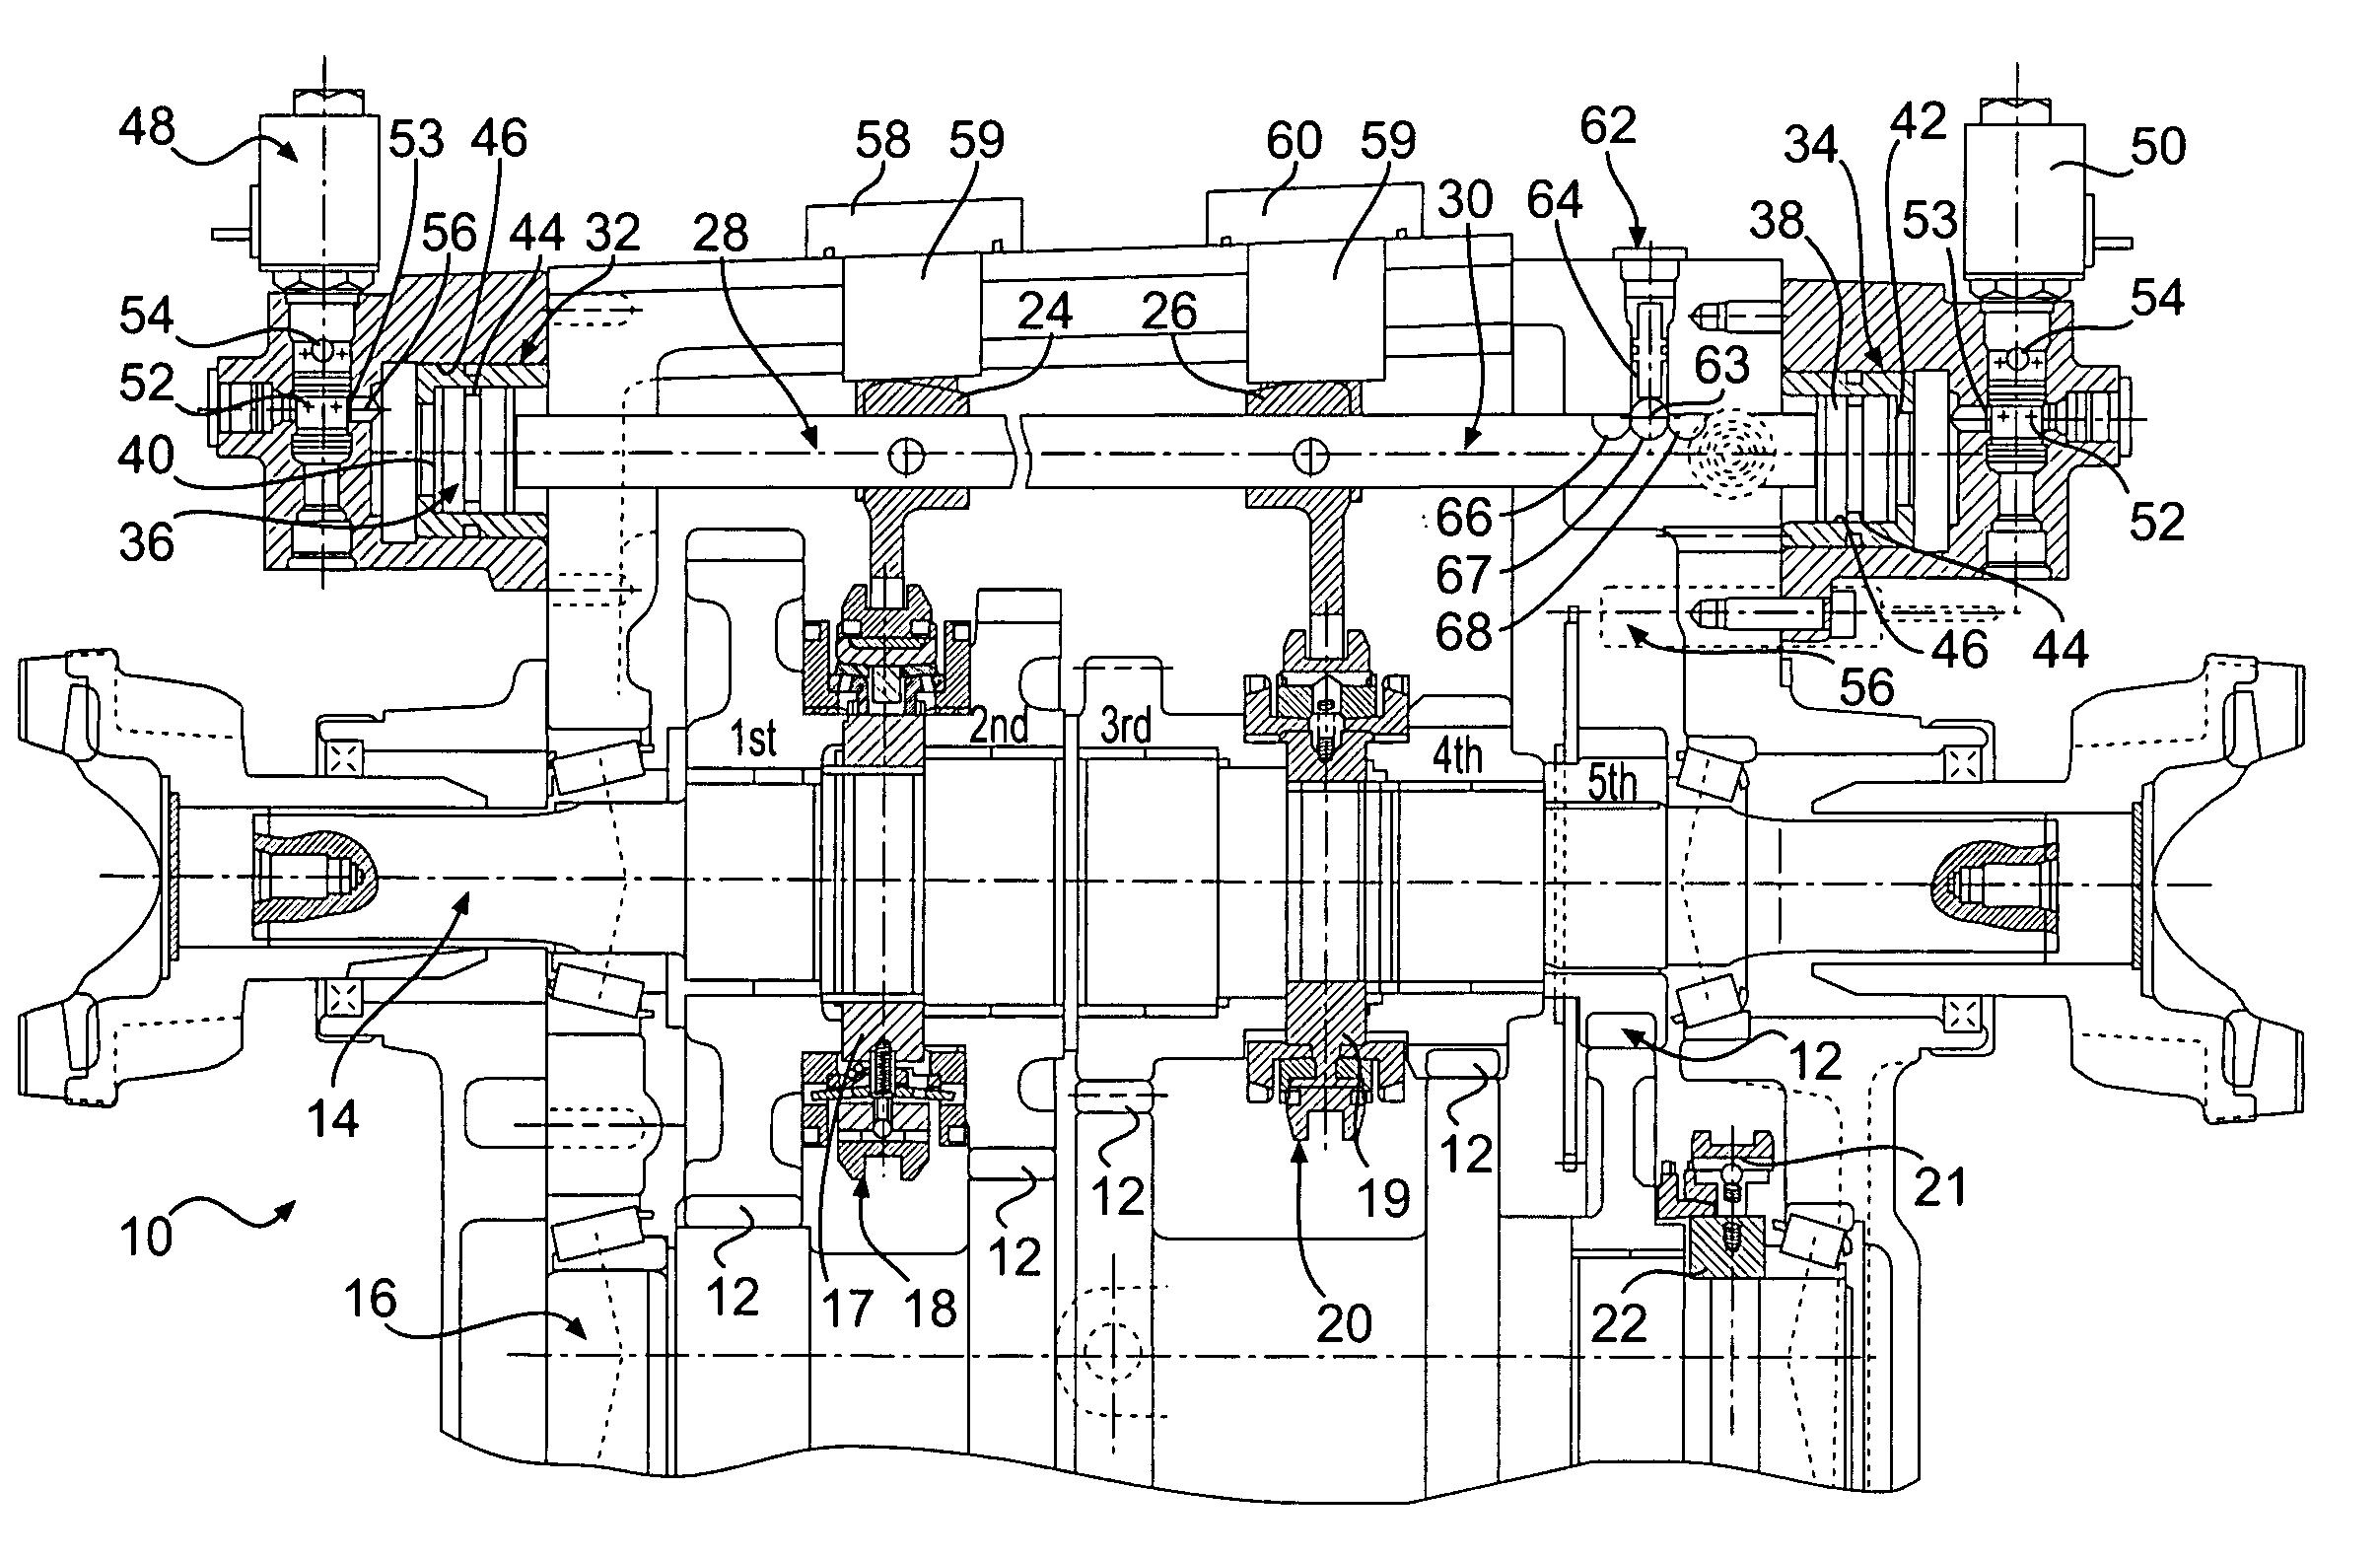 m s mc800 intercom wiring diagrams security diagram wiring